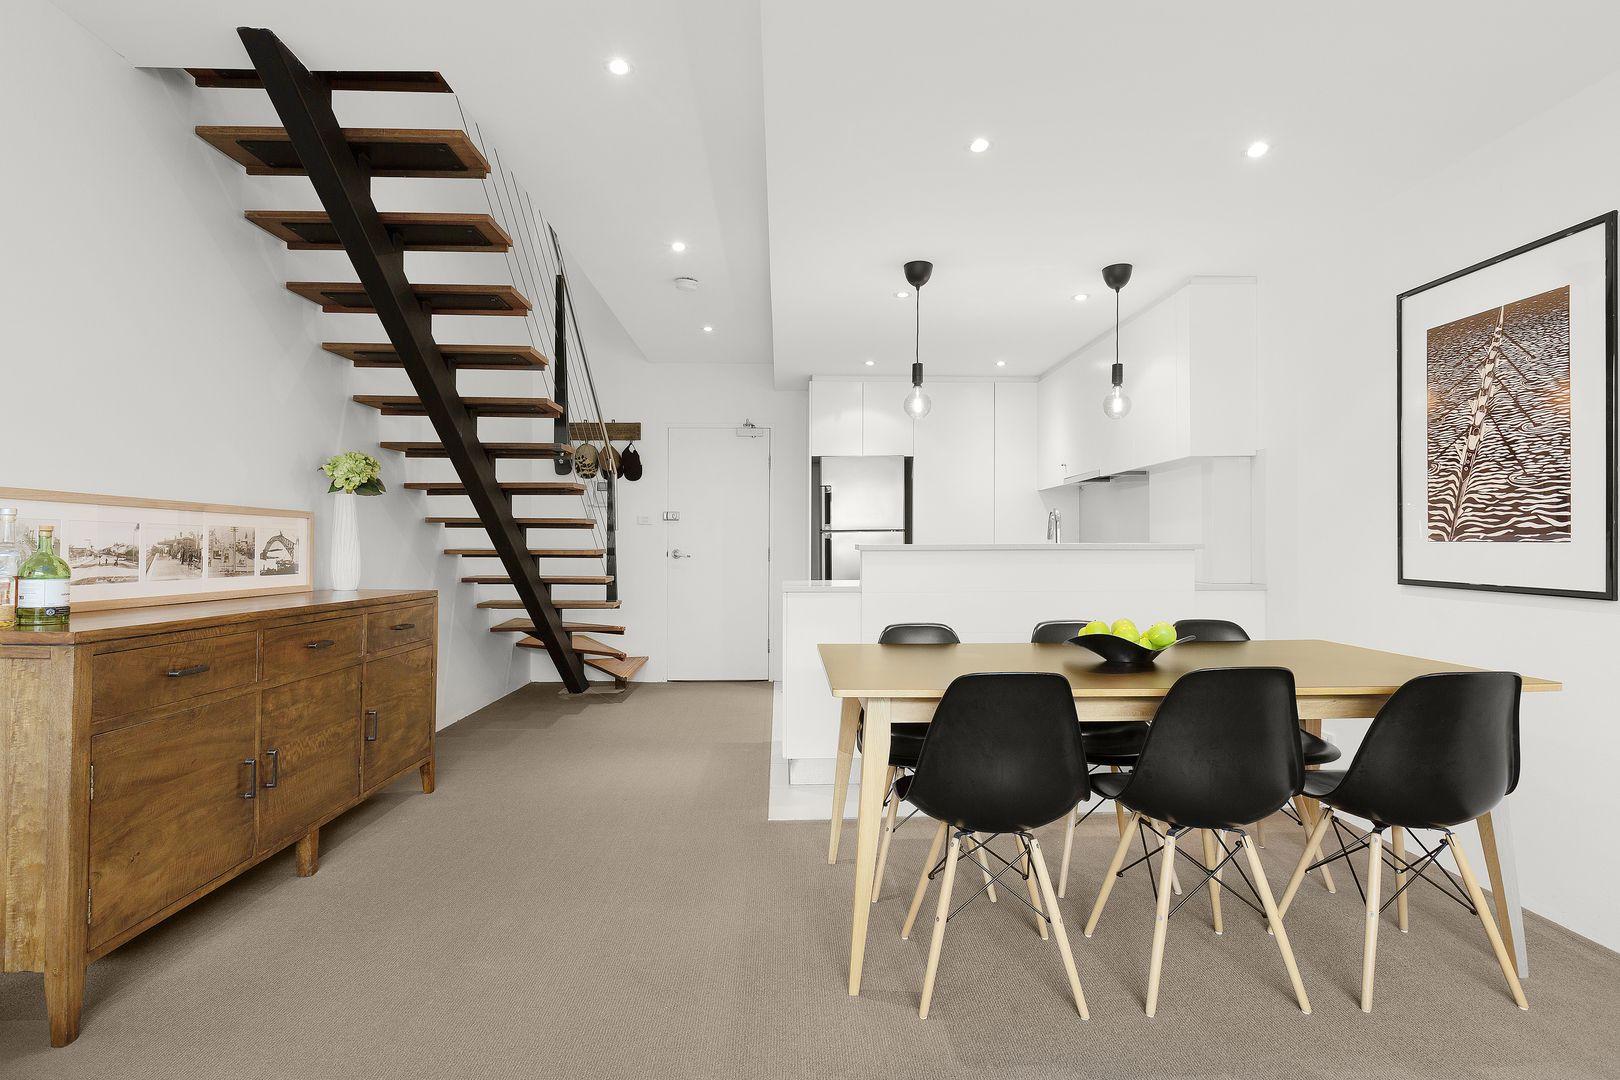 2 bedrooms Apartment / Unit / Flat in 36/25 Birmingham Street ALEXANDRIA NSW, 2015